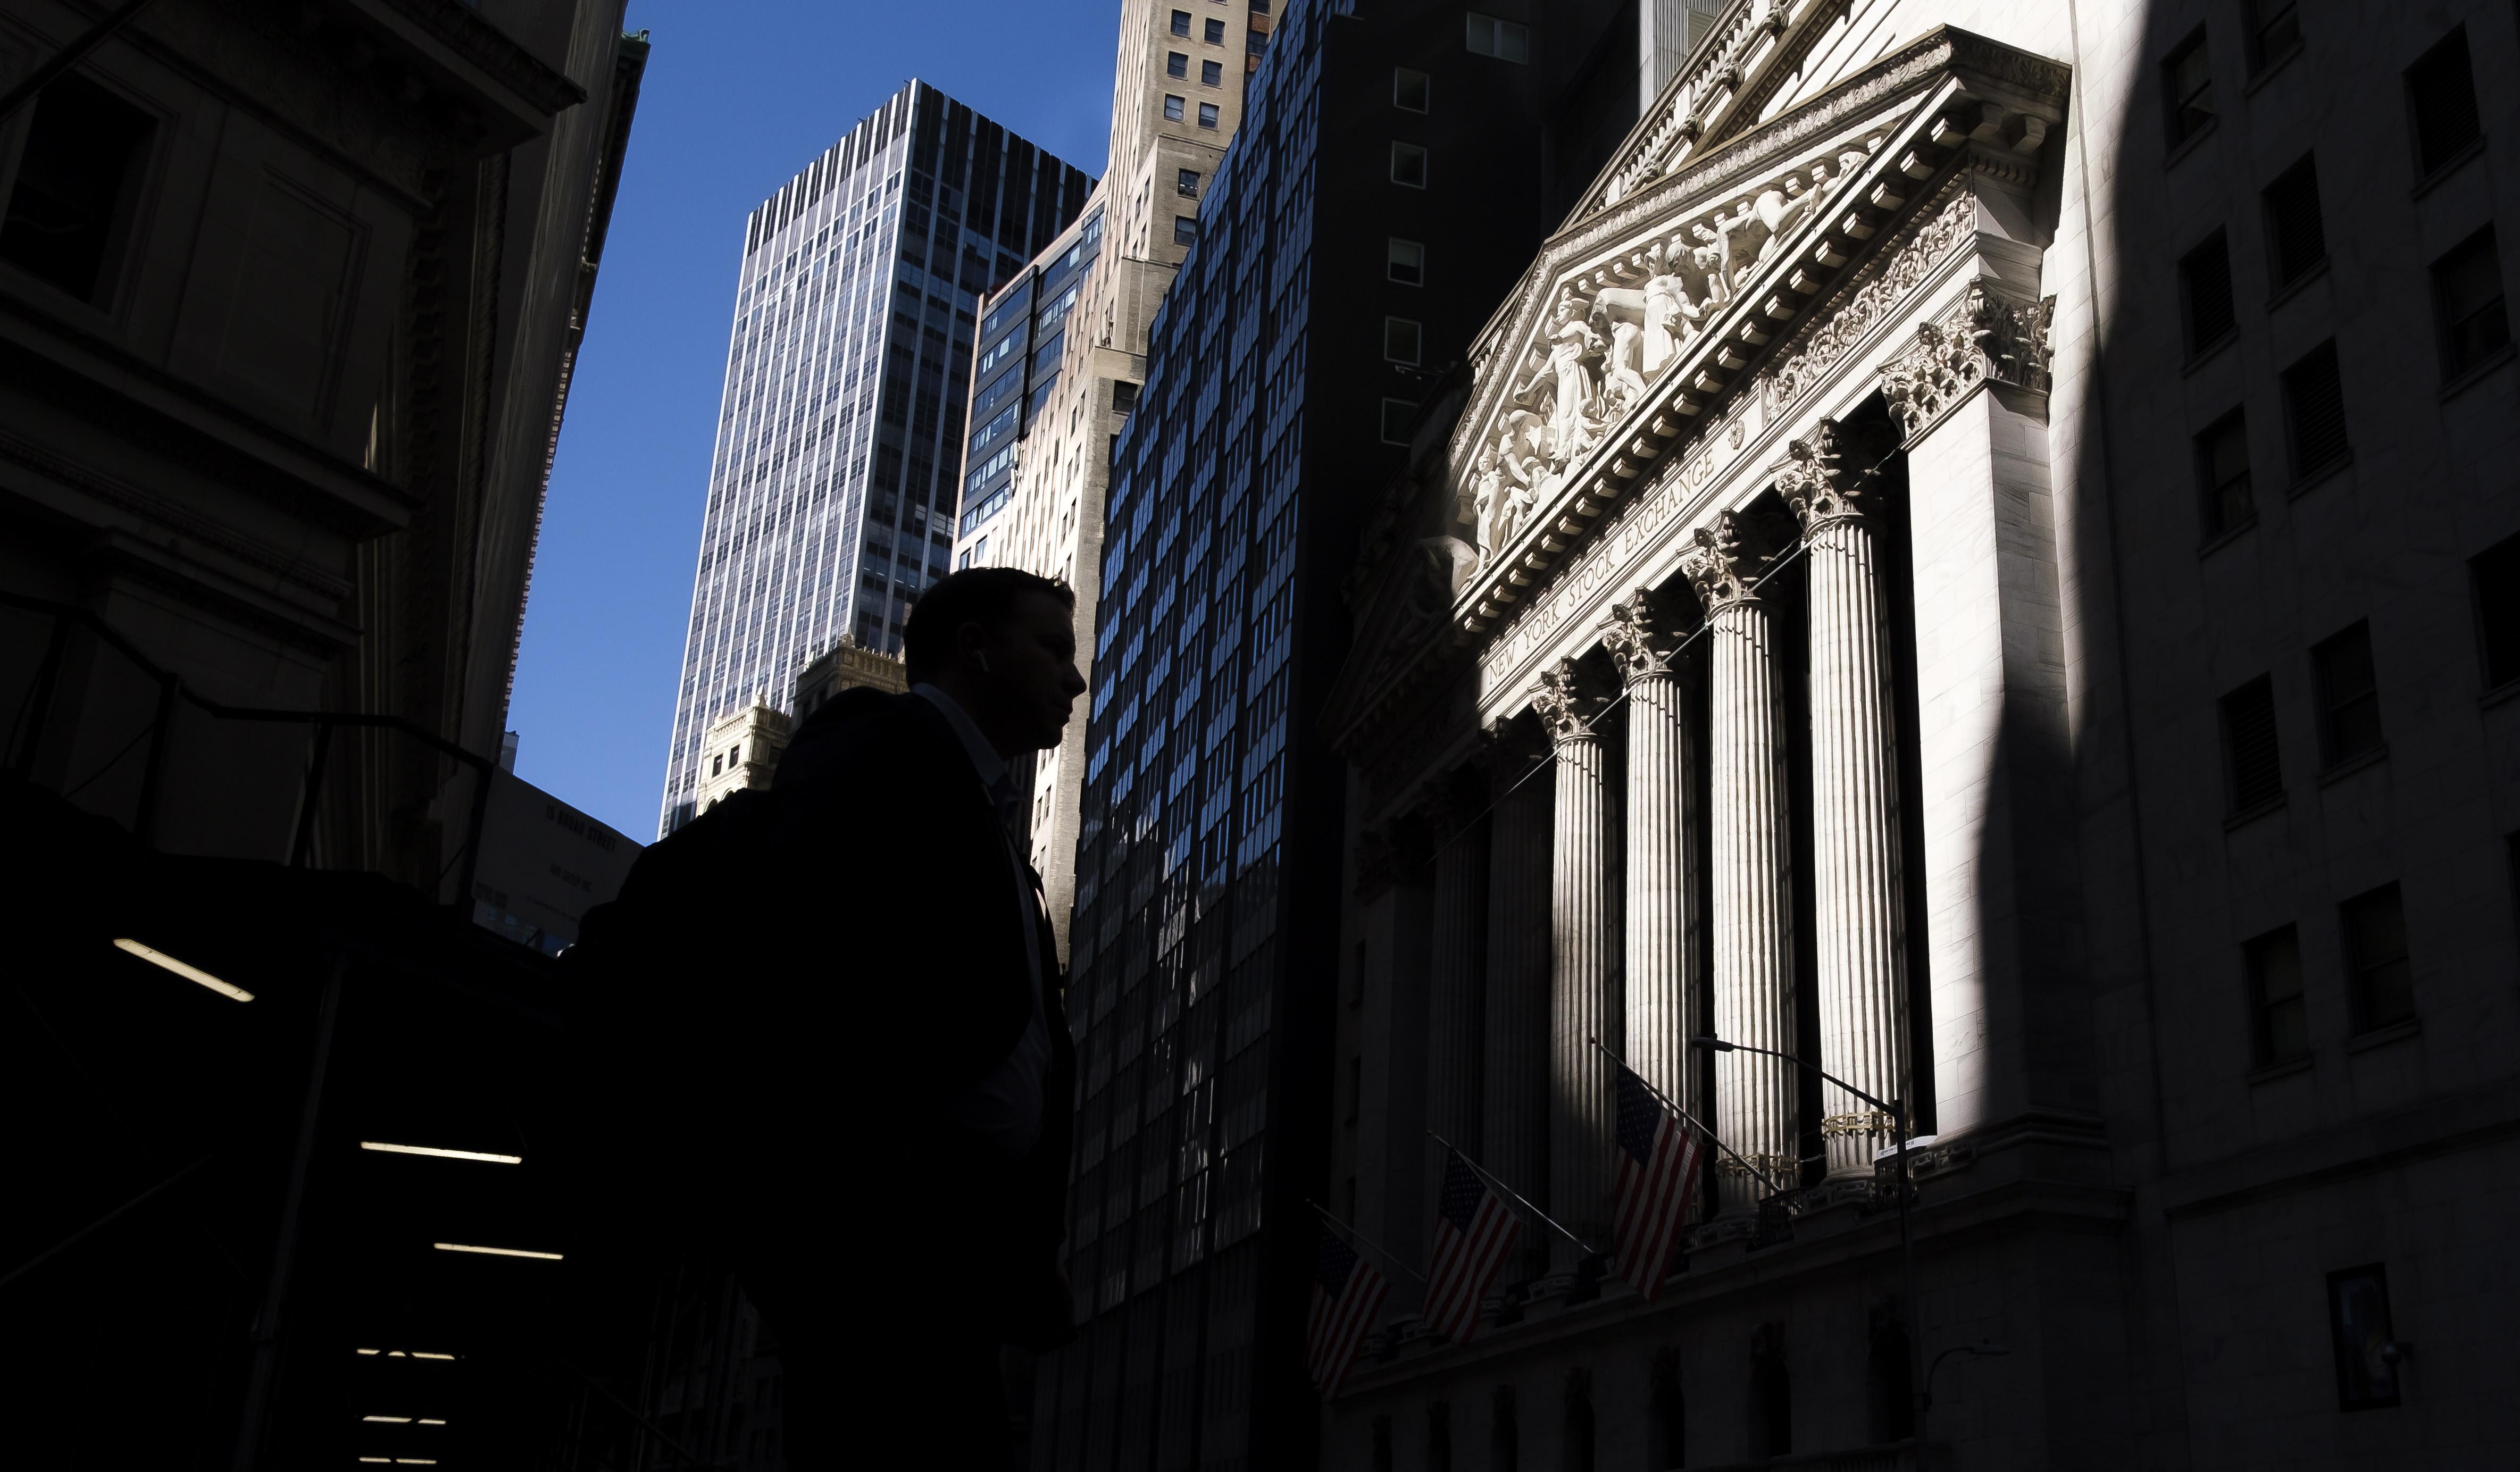 New Yorgi börsi hoone kaasaajal Foto: Scanpix/EPA